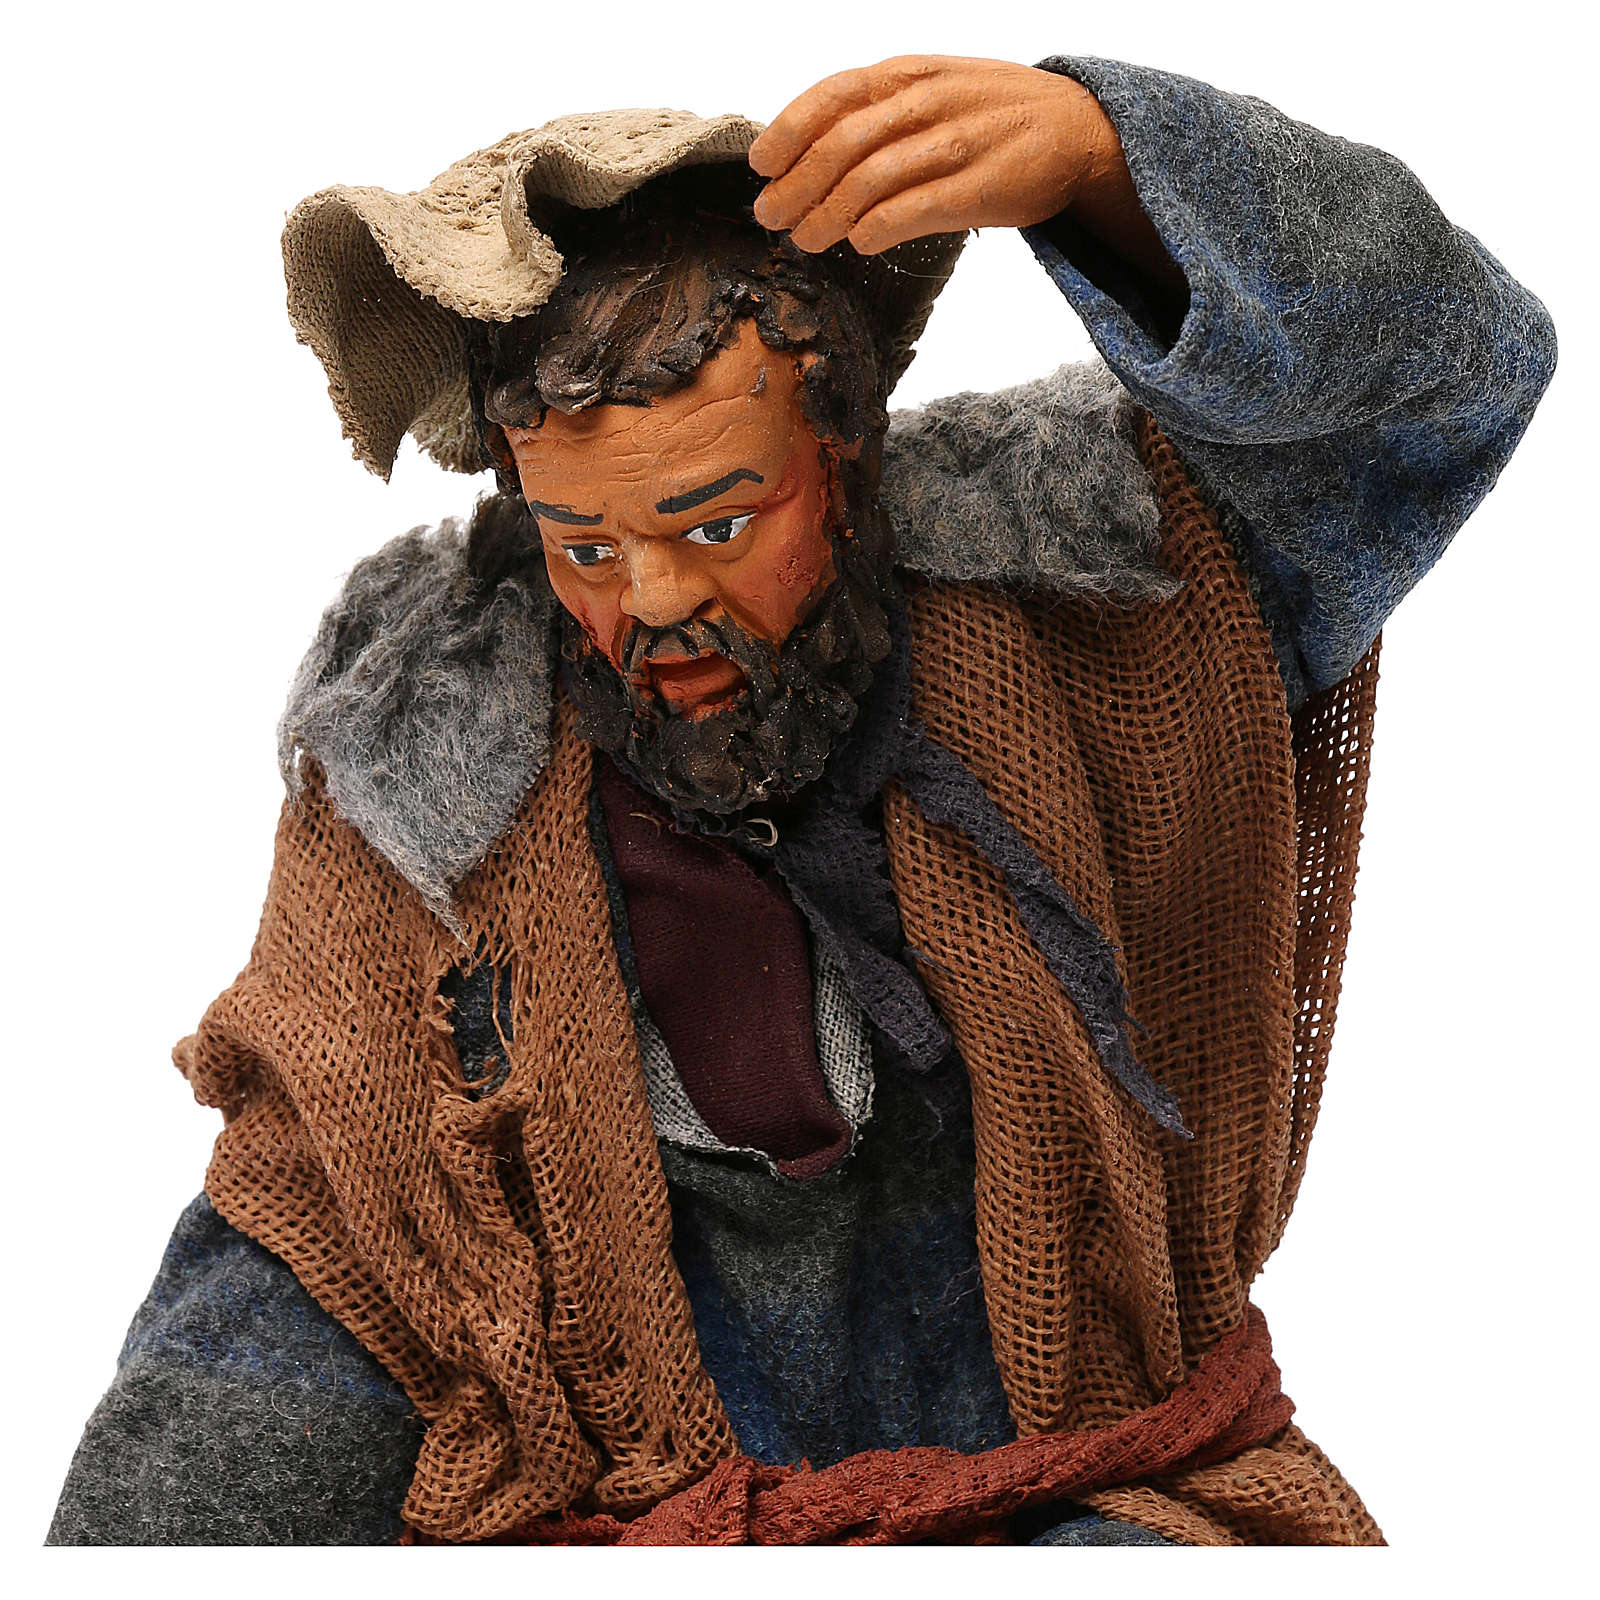 STOCK Pastore inginocchiato vestito in terracotta 30 cm Presepe Napoletano 4